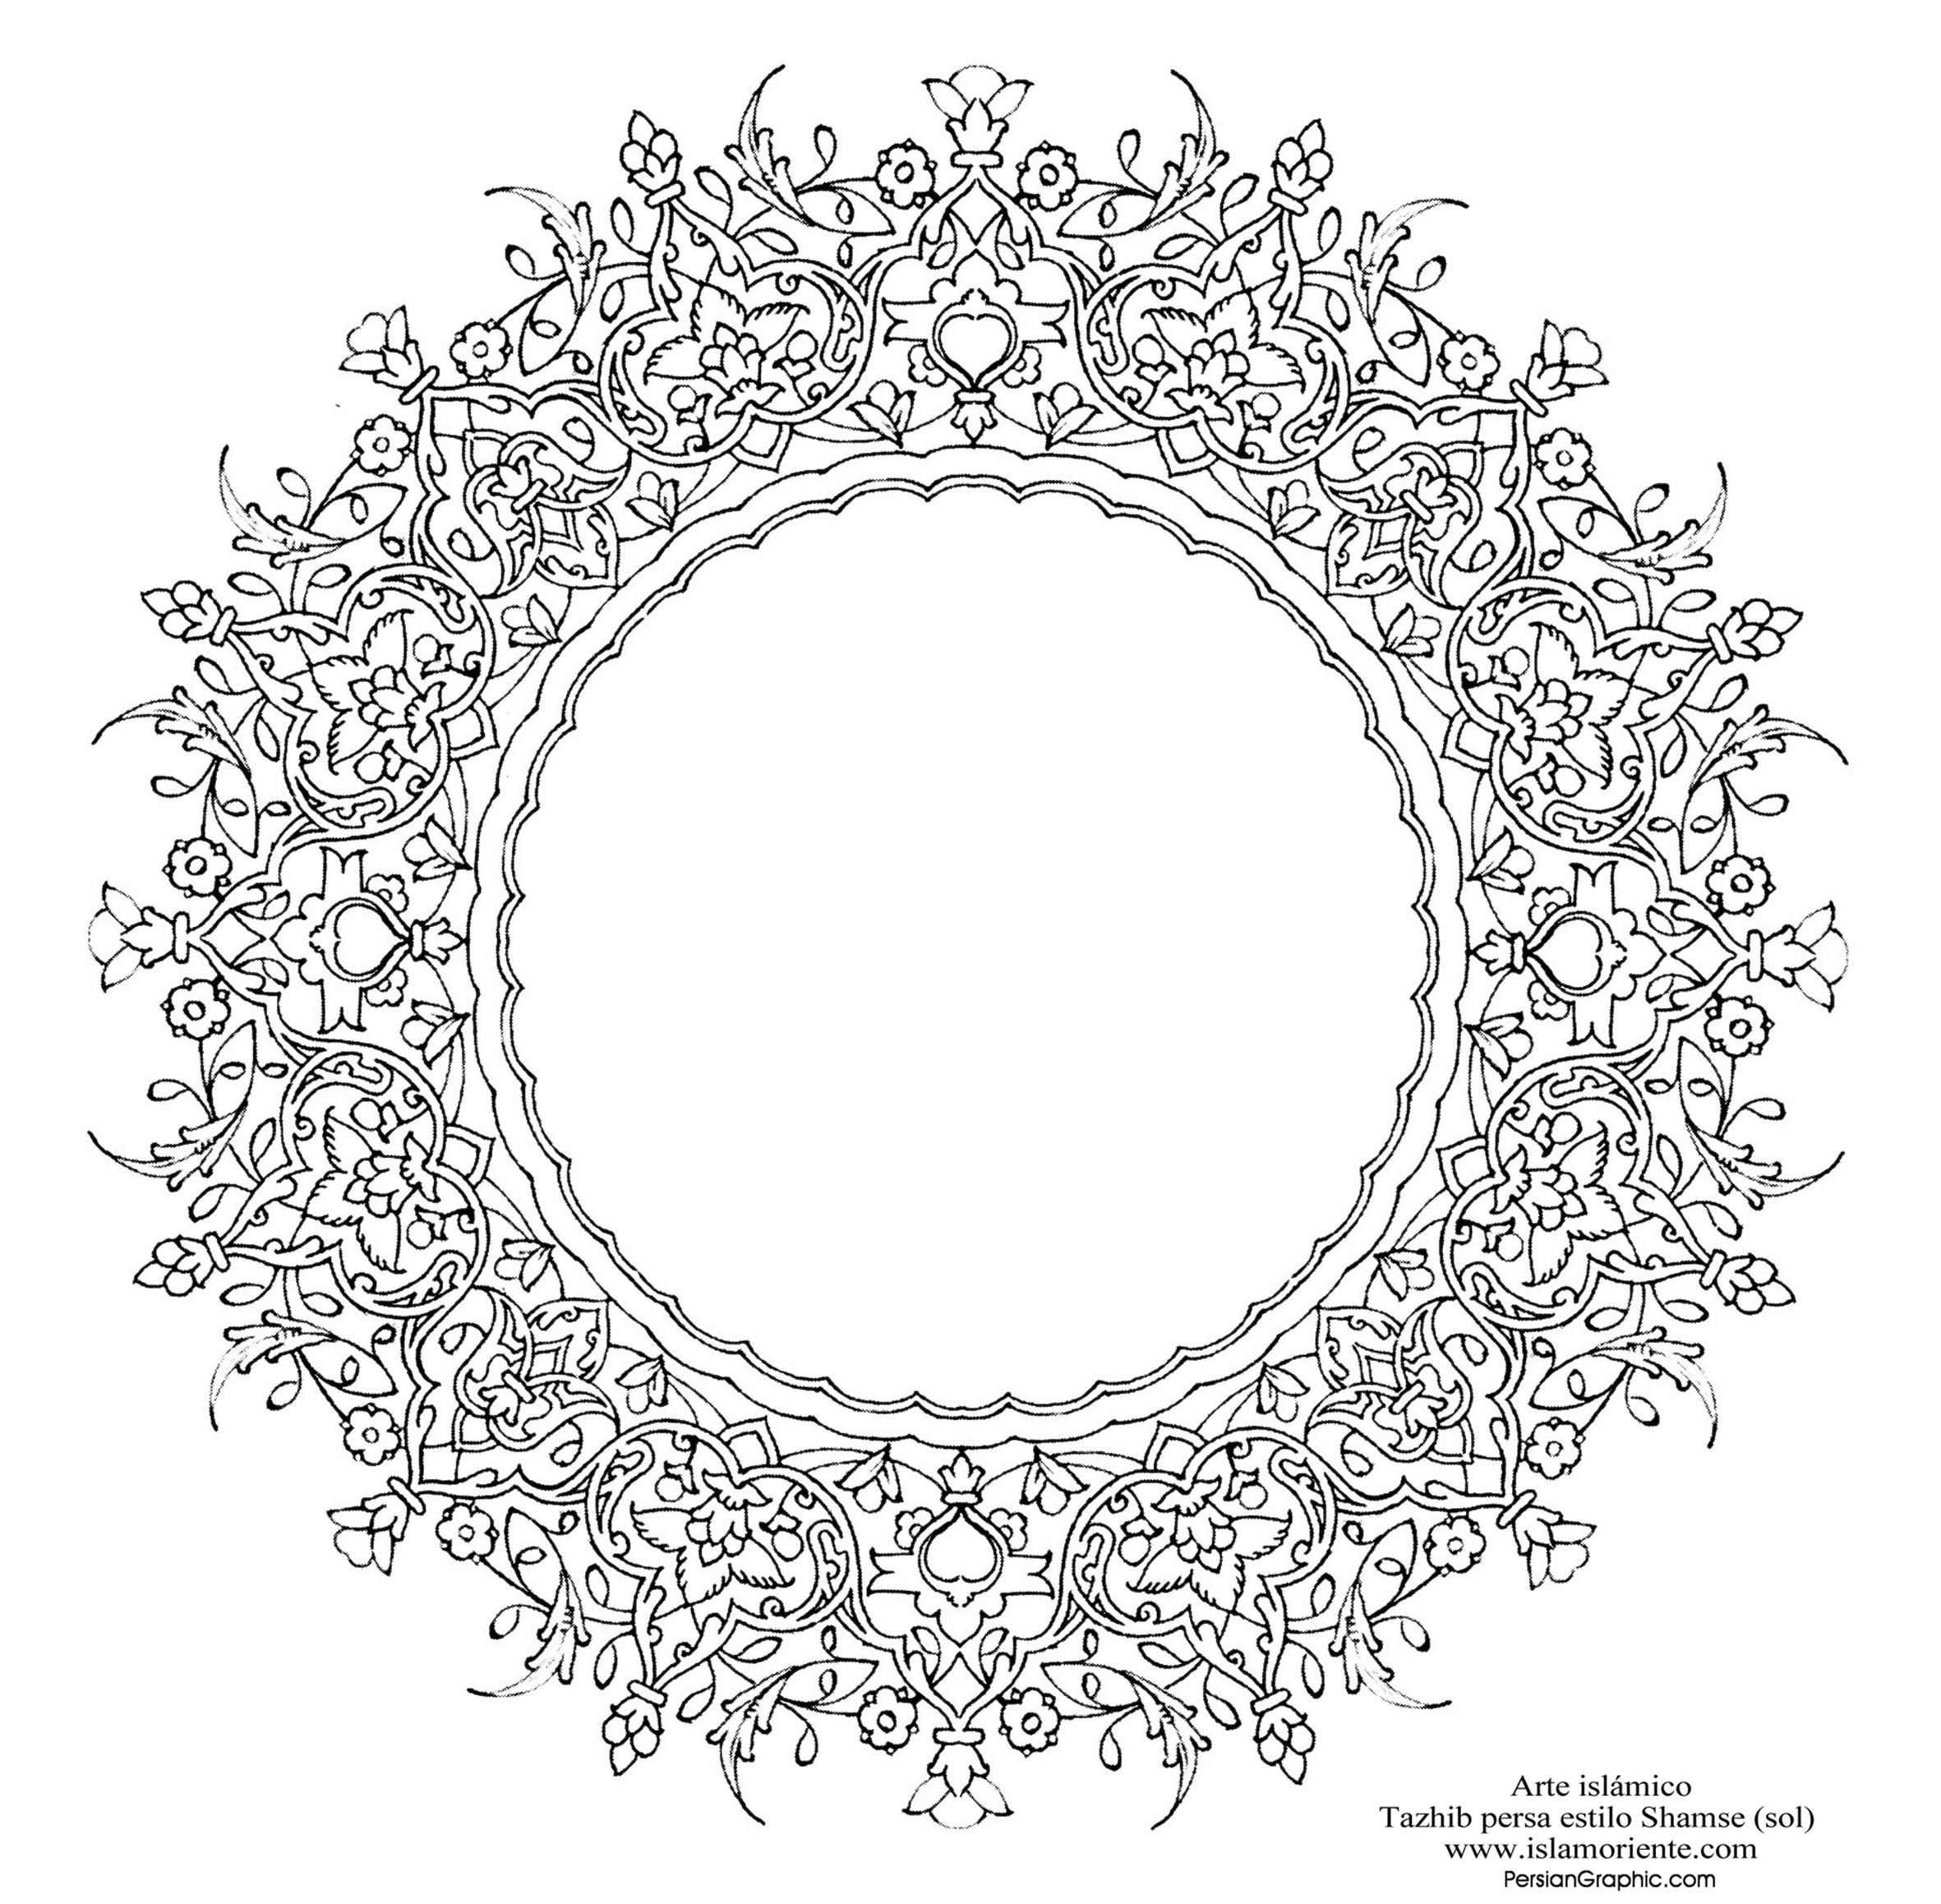 Arte Islámico- Tazhib Persa Estilo Shamse (sol)-11